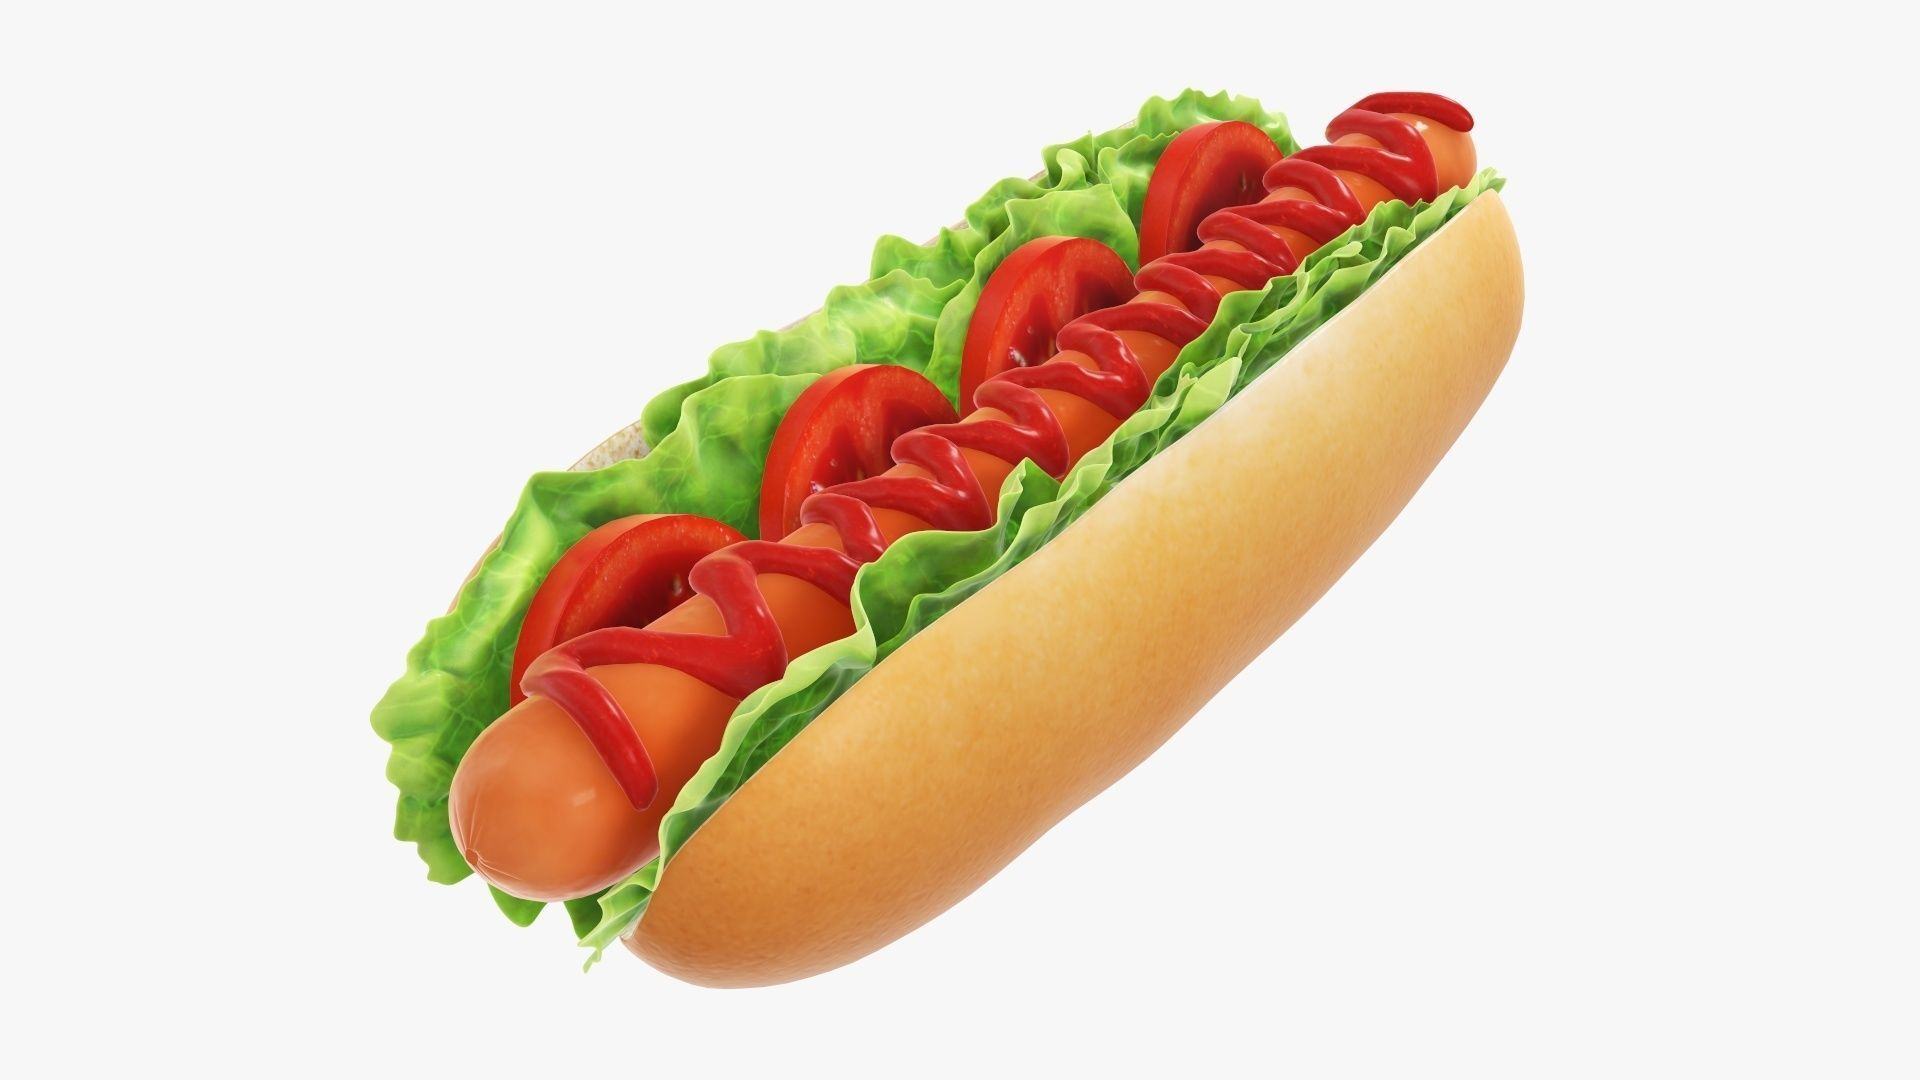 Hot dog with ketchup salad and tomato